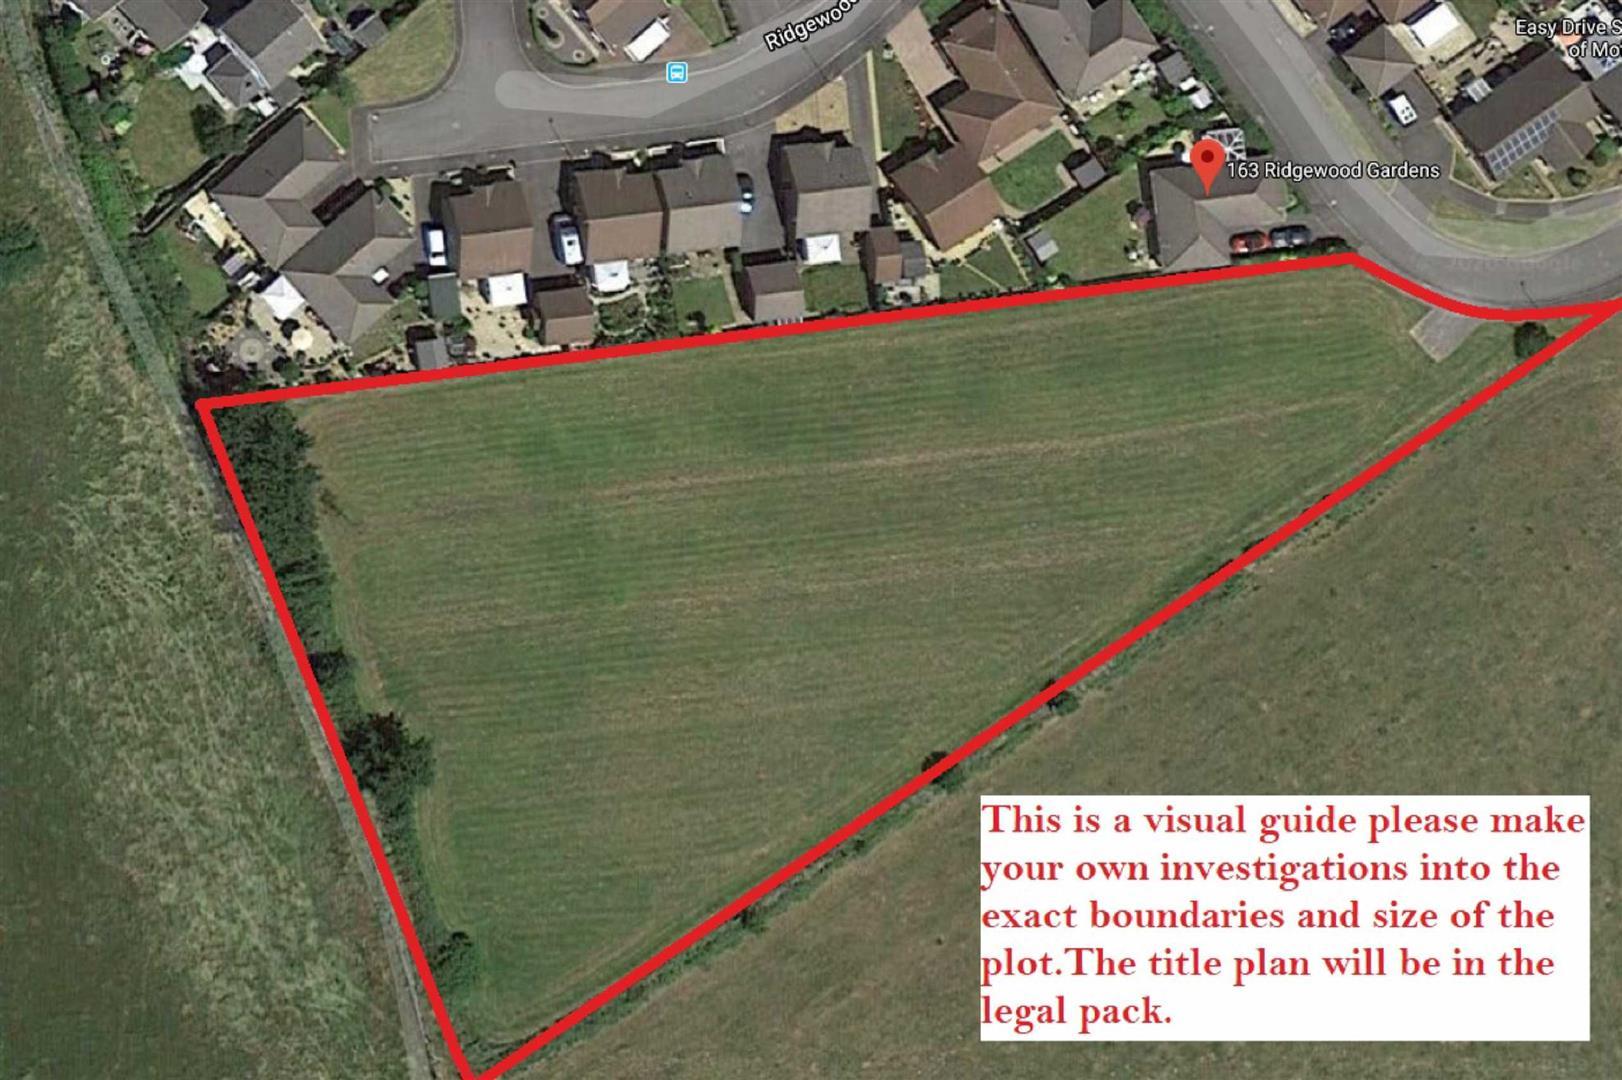 Ridgewood Gardens, Cimla, Neath, SA11 3QX